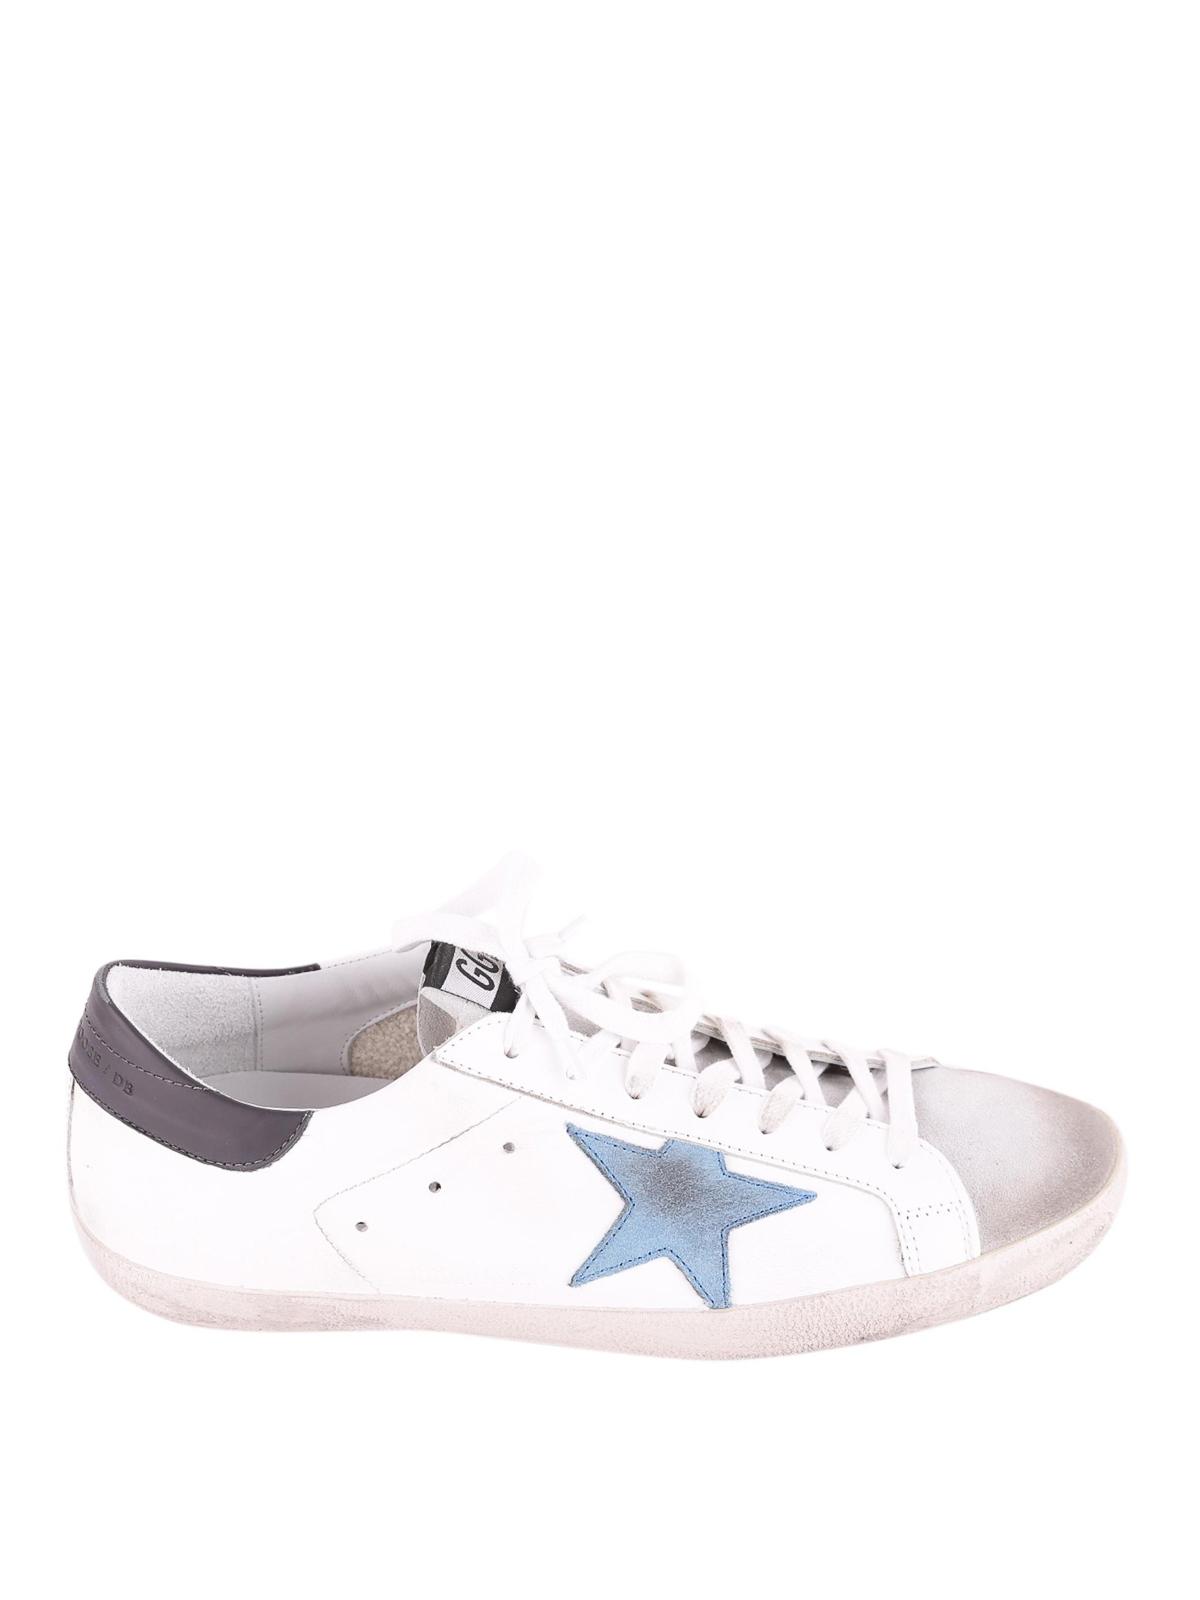 f6794e8336b Golden Goose - Superstar light blue star sneakers - trainers ...